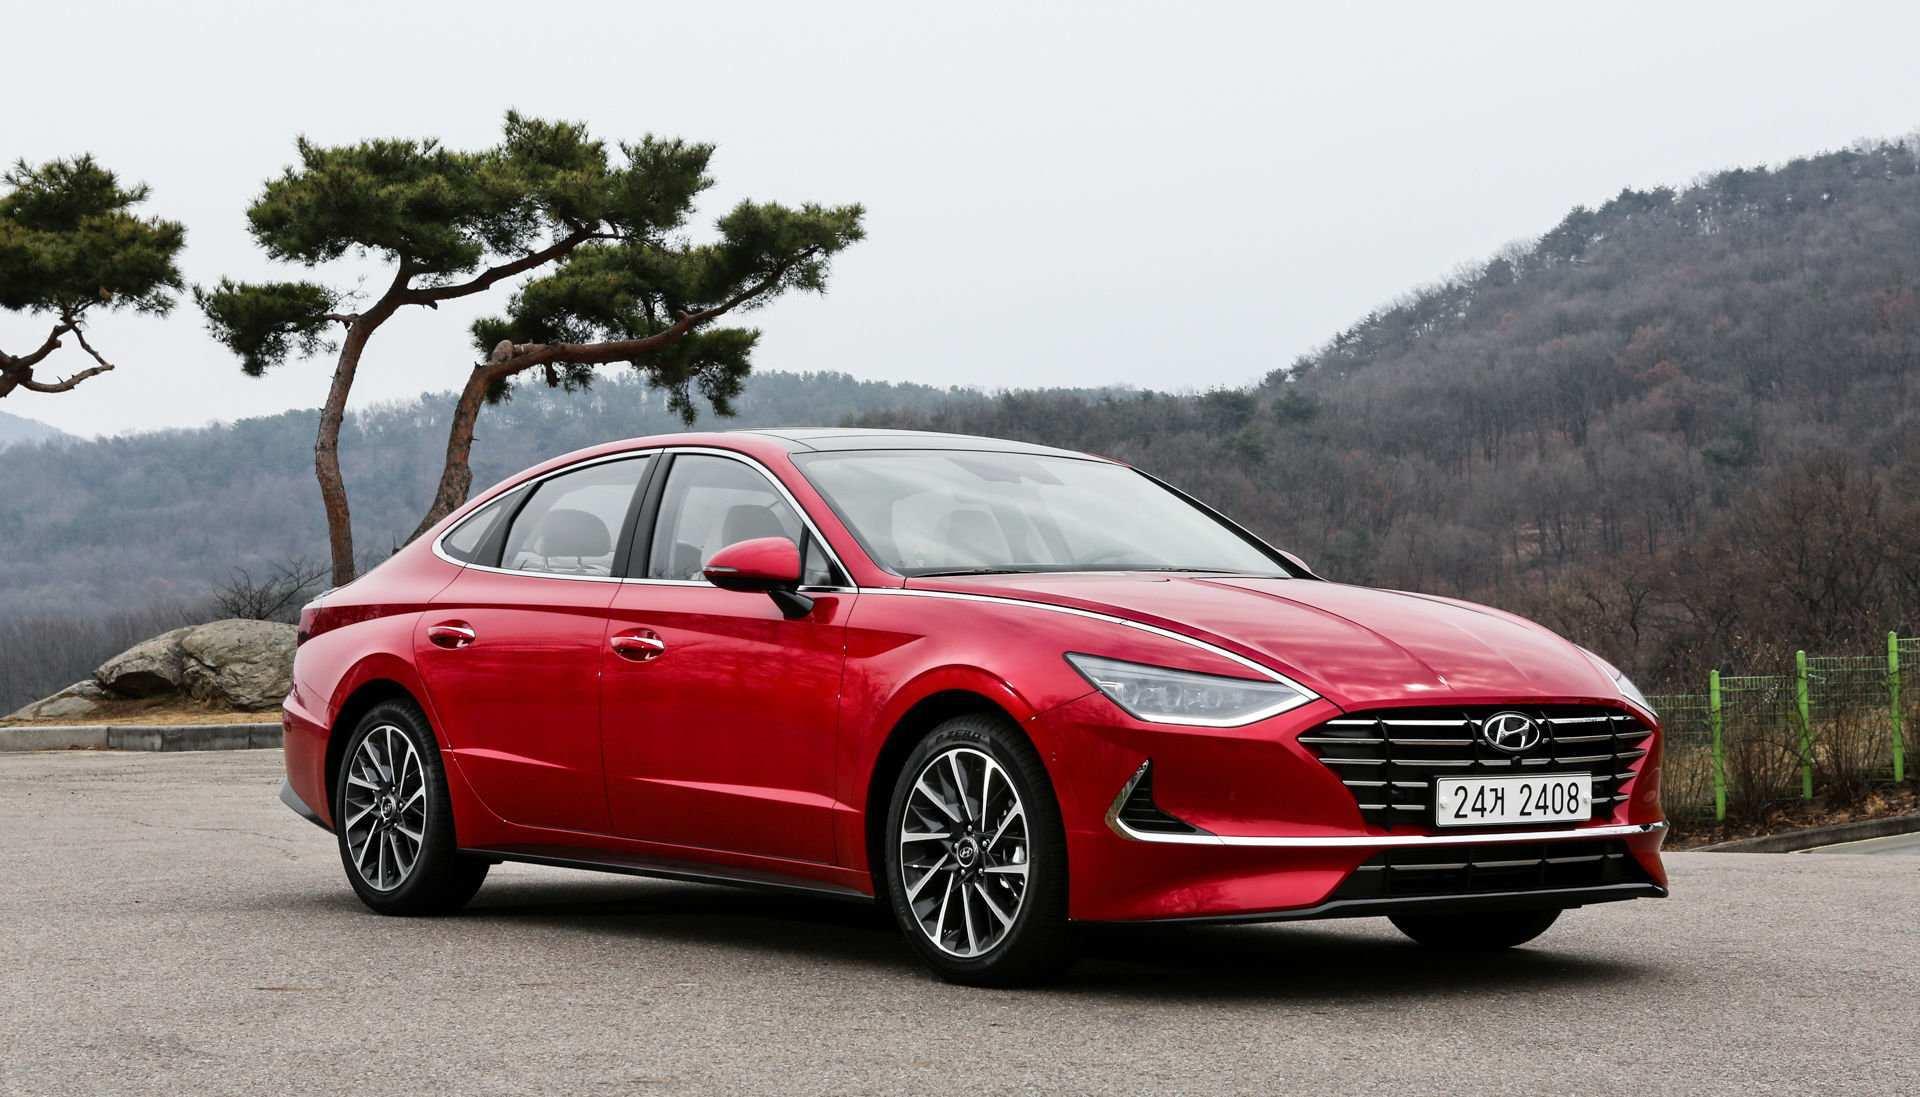 76 New Hyundai Sonata 2020 Price Concept with Hyundai Sonata 2020 Price